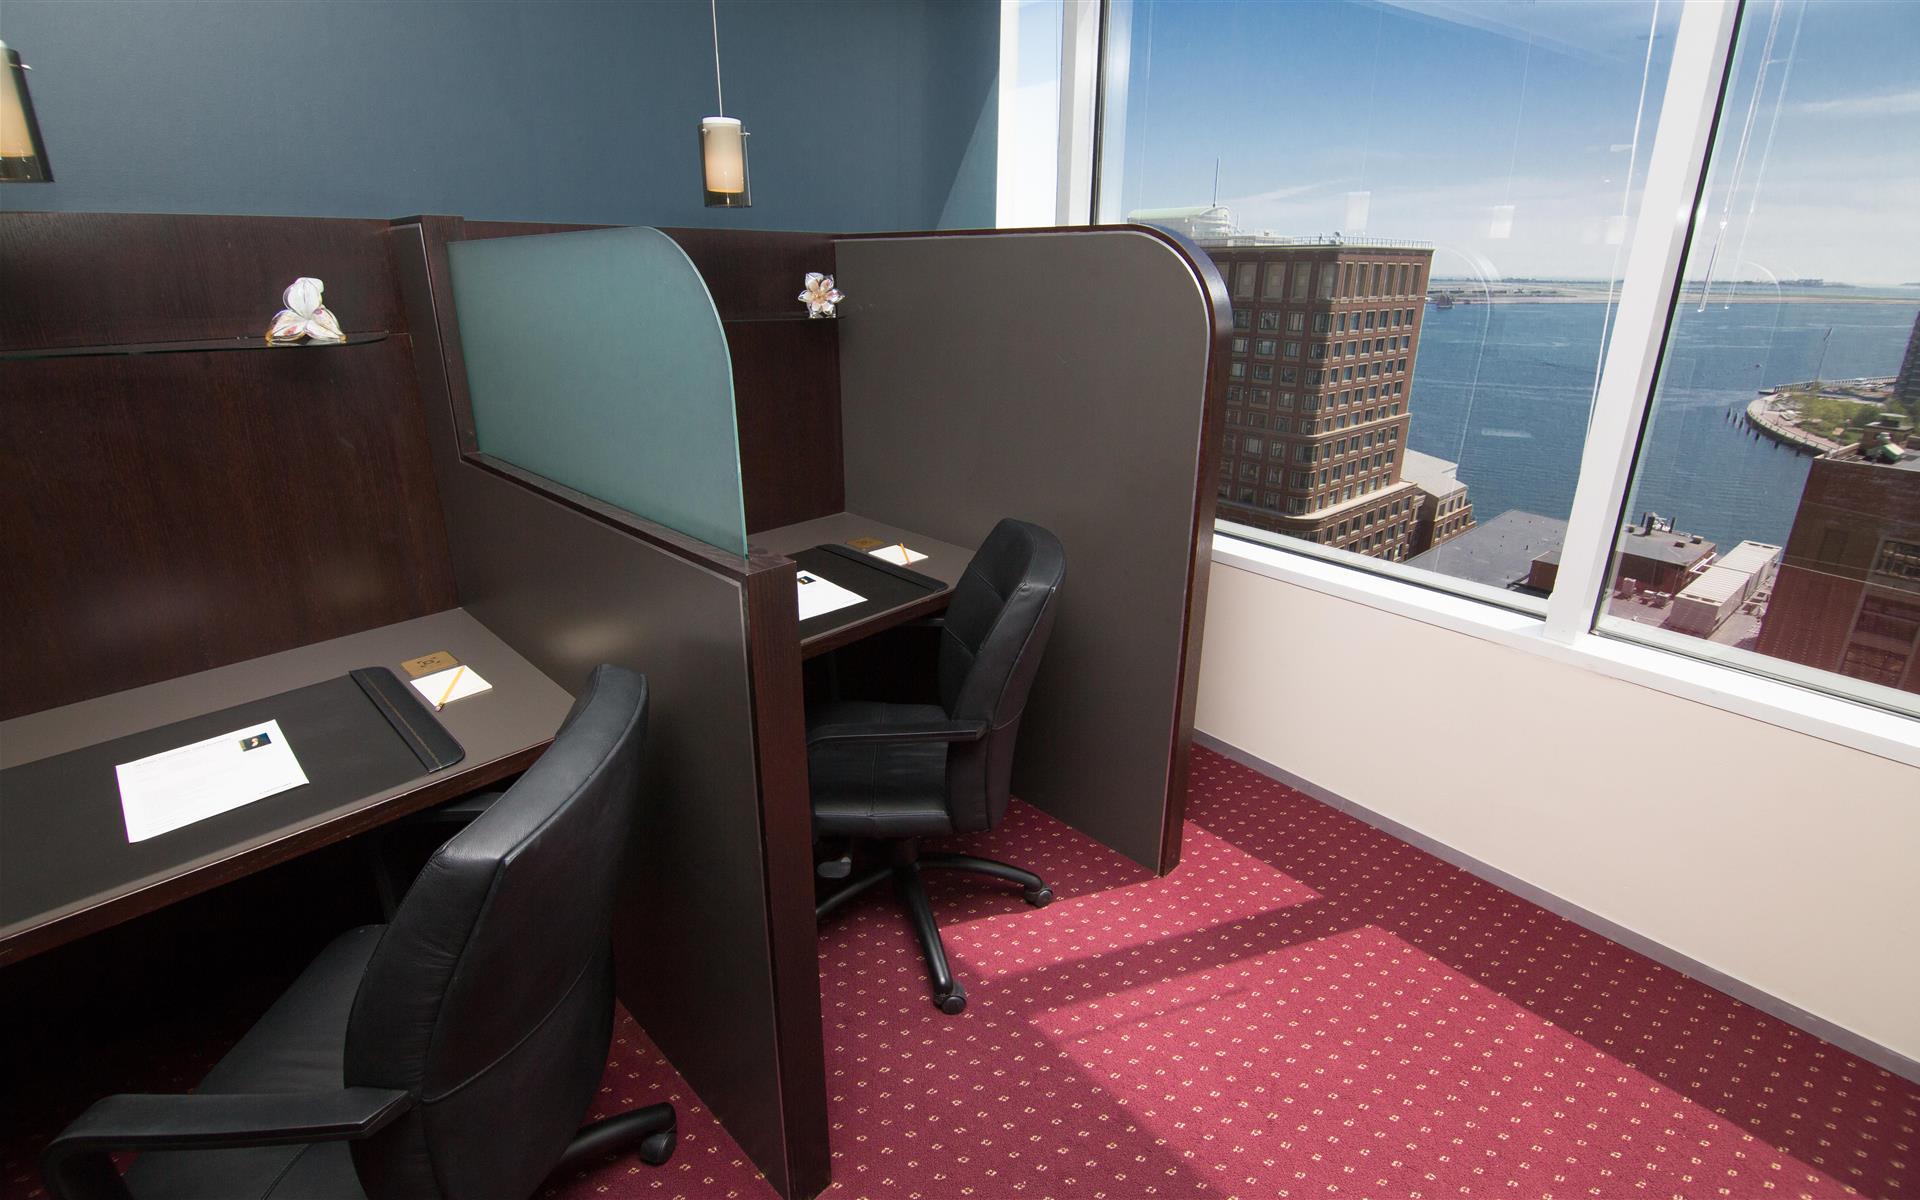 Servcorp - Boston One International Place - Coworking Lounge Workstation 1